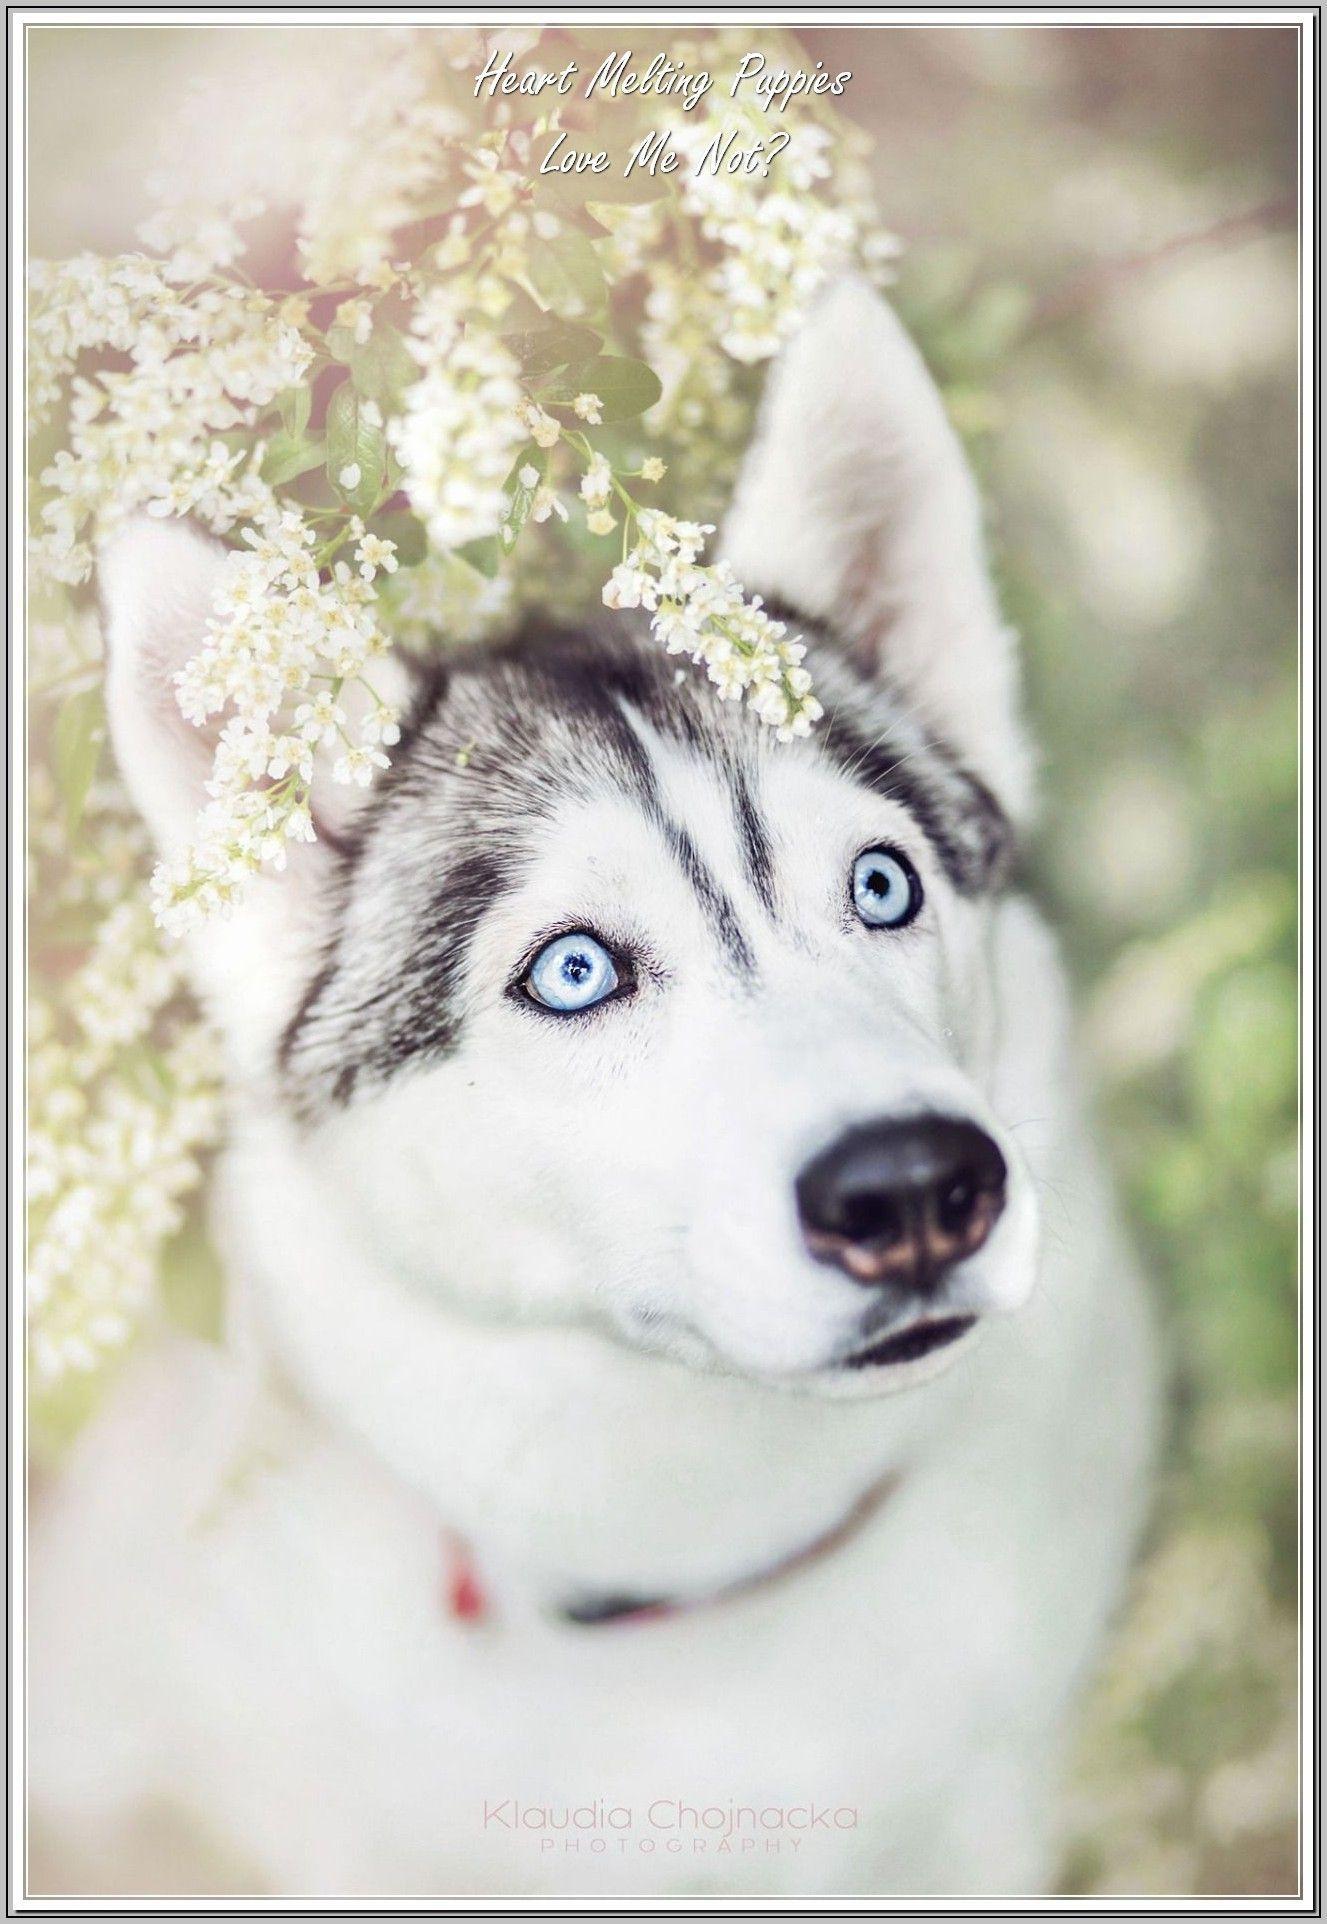 Experts Advice On Dog Care *** Visit the image link for more details. #prettydog #puppy #puppies #pichonmaltes #dog #dgs #bichonmaltestoy @bichonmaltesprecio #bichonmaltesadulto #comprarbichonmaltes #maltesedogbuy #maltesedog #maltesdogbreeds #maltipoo #Koreanmaltese